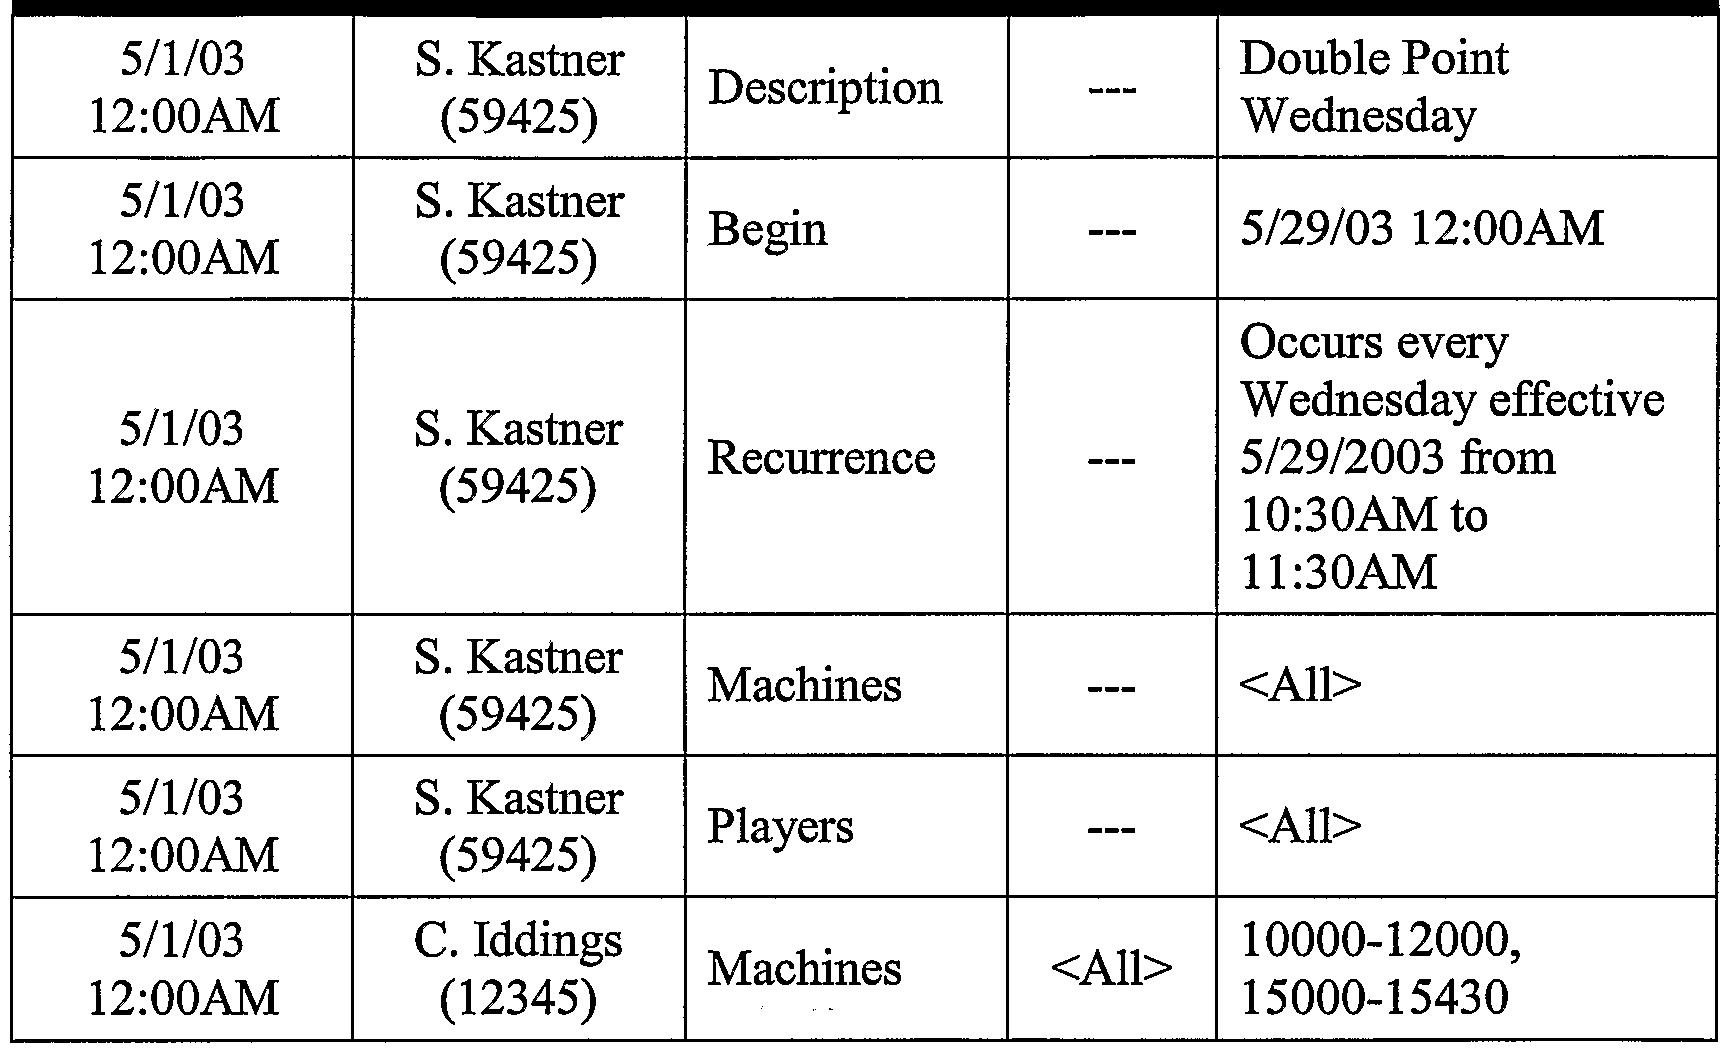 bináris opciók bingó indikátor